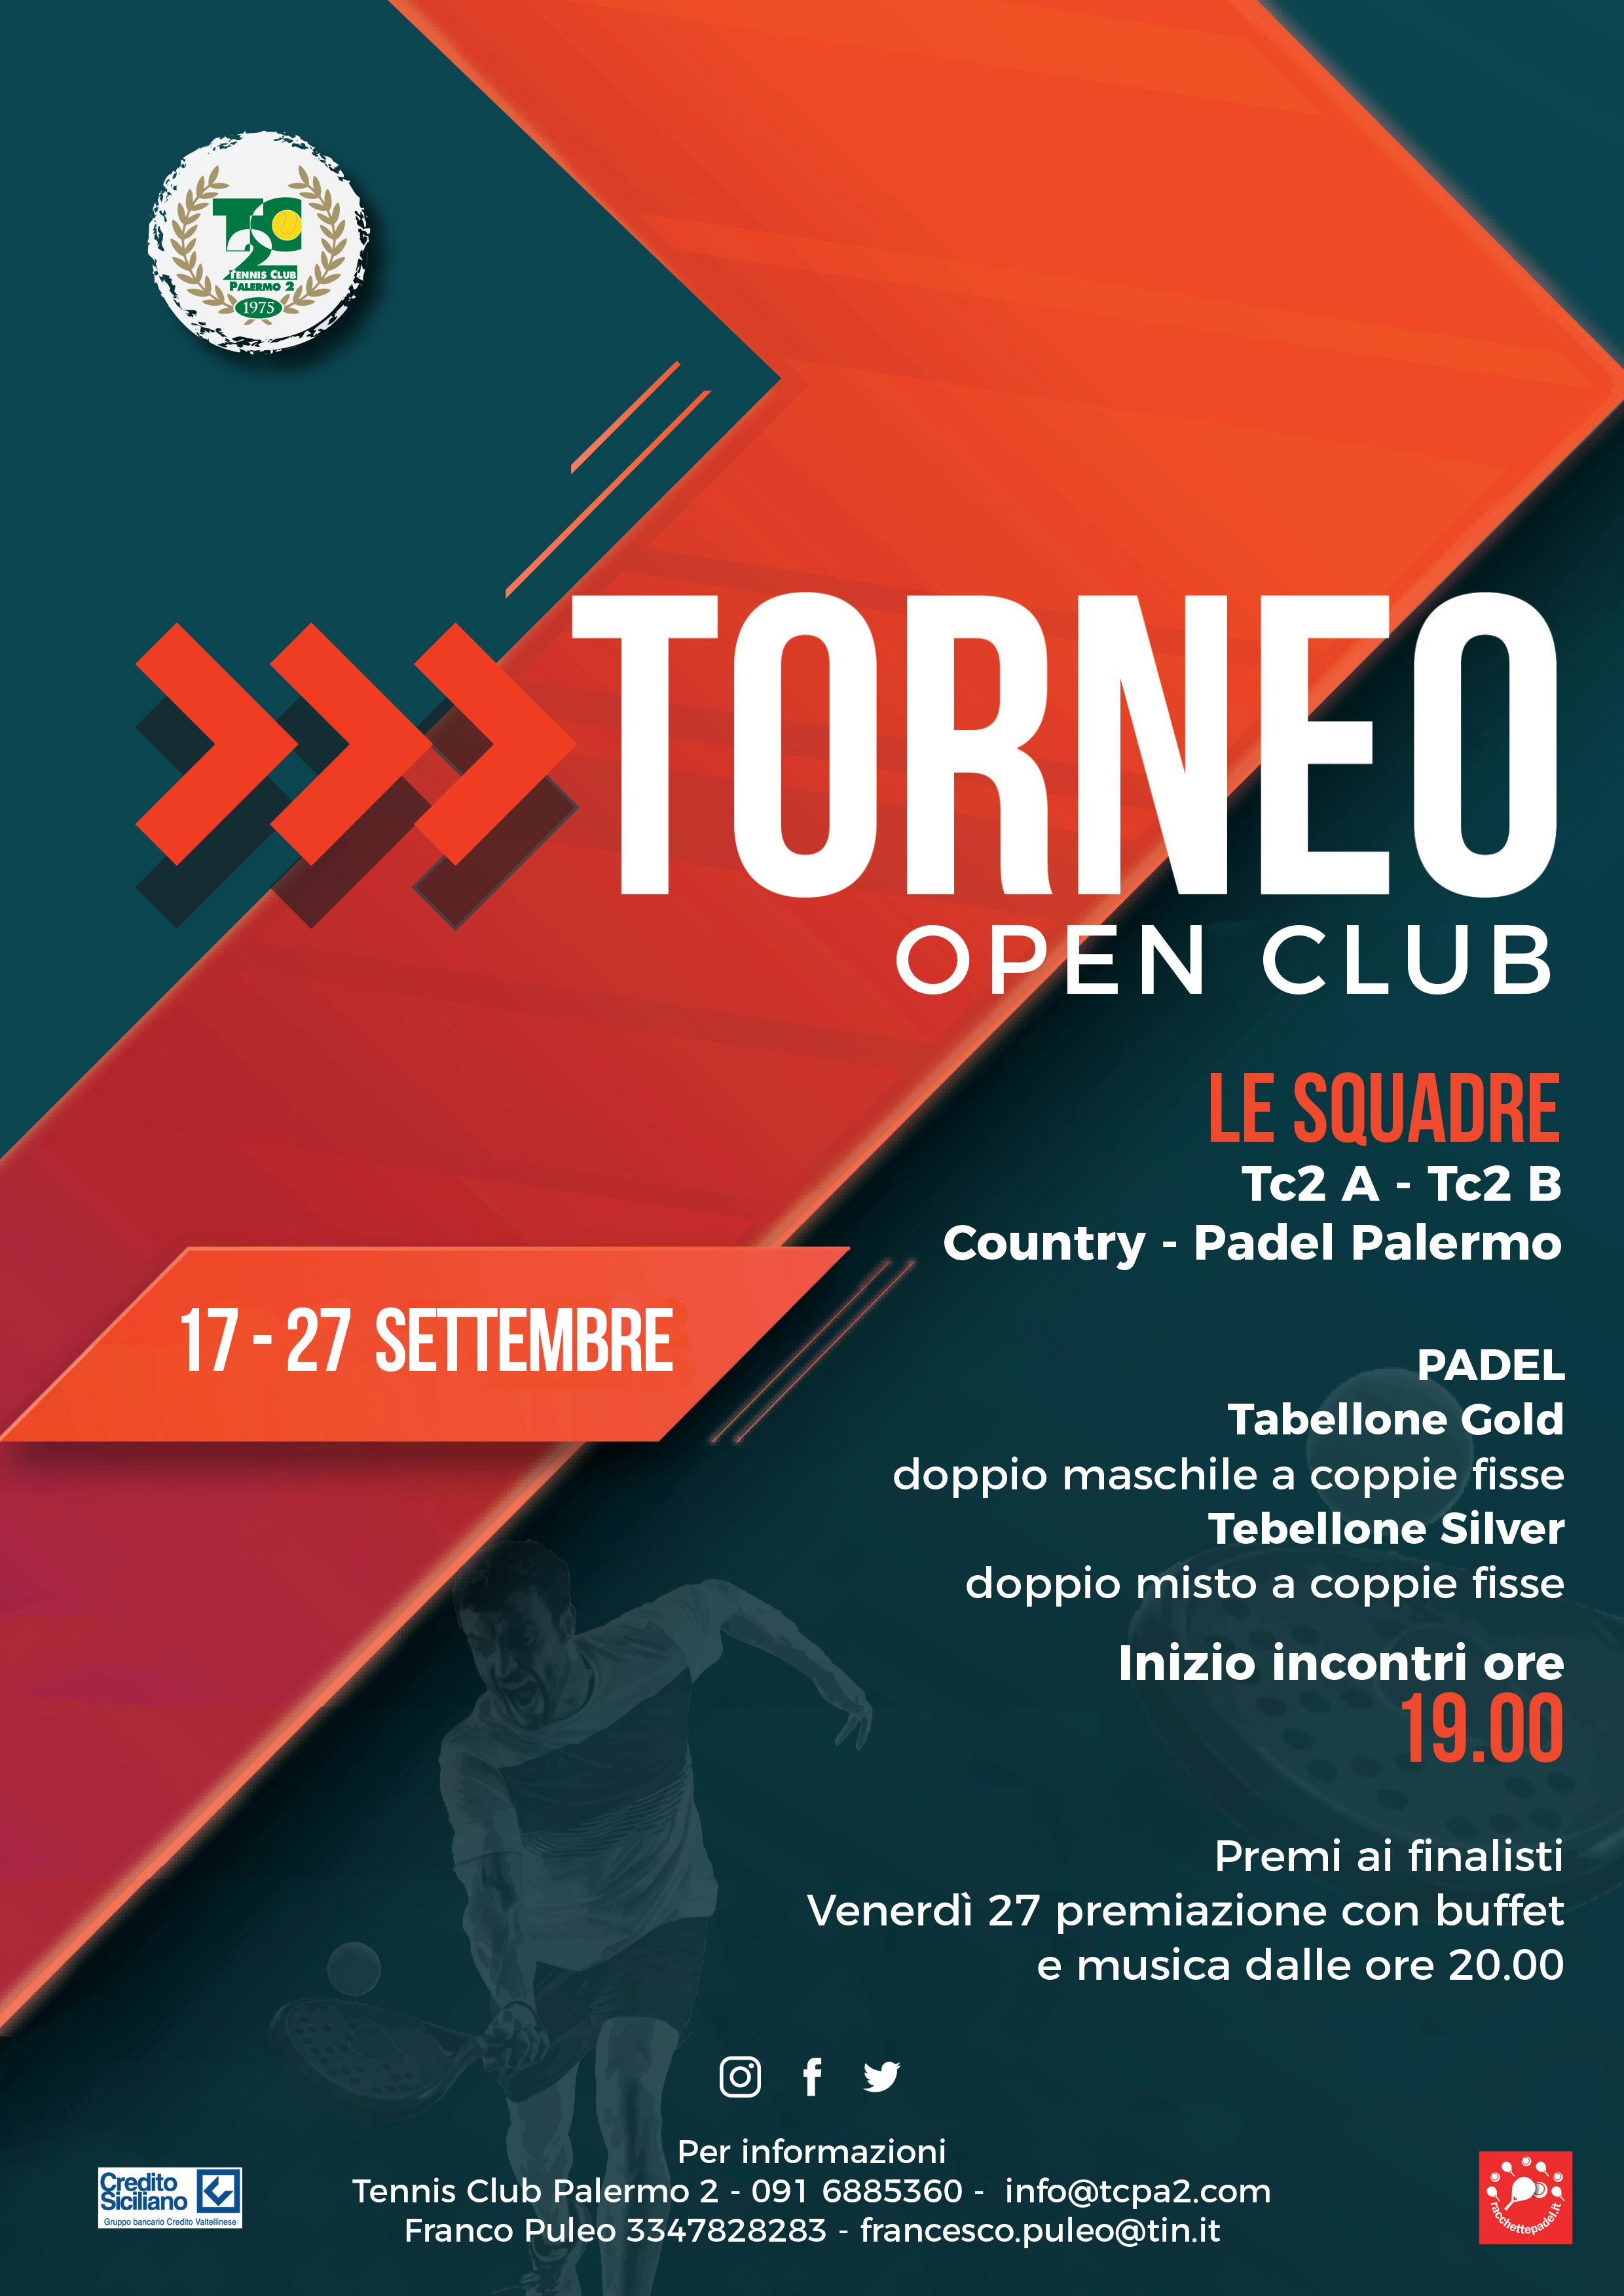 torneo-open-club